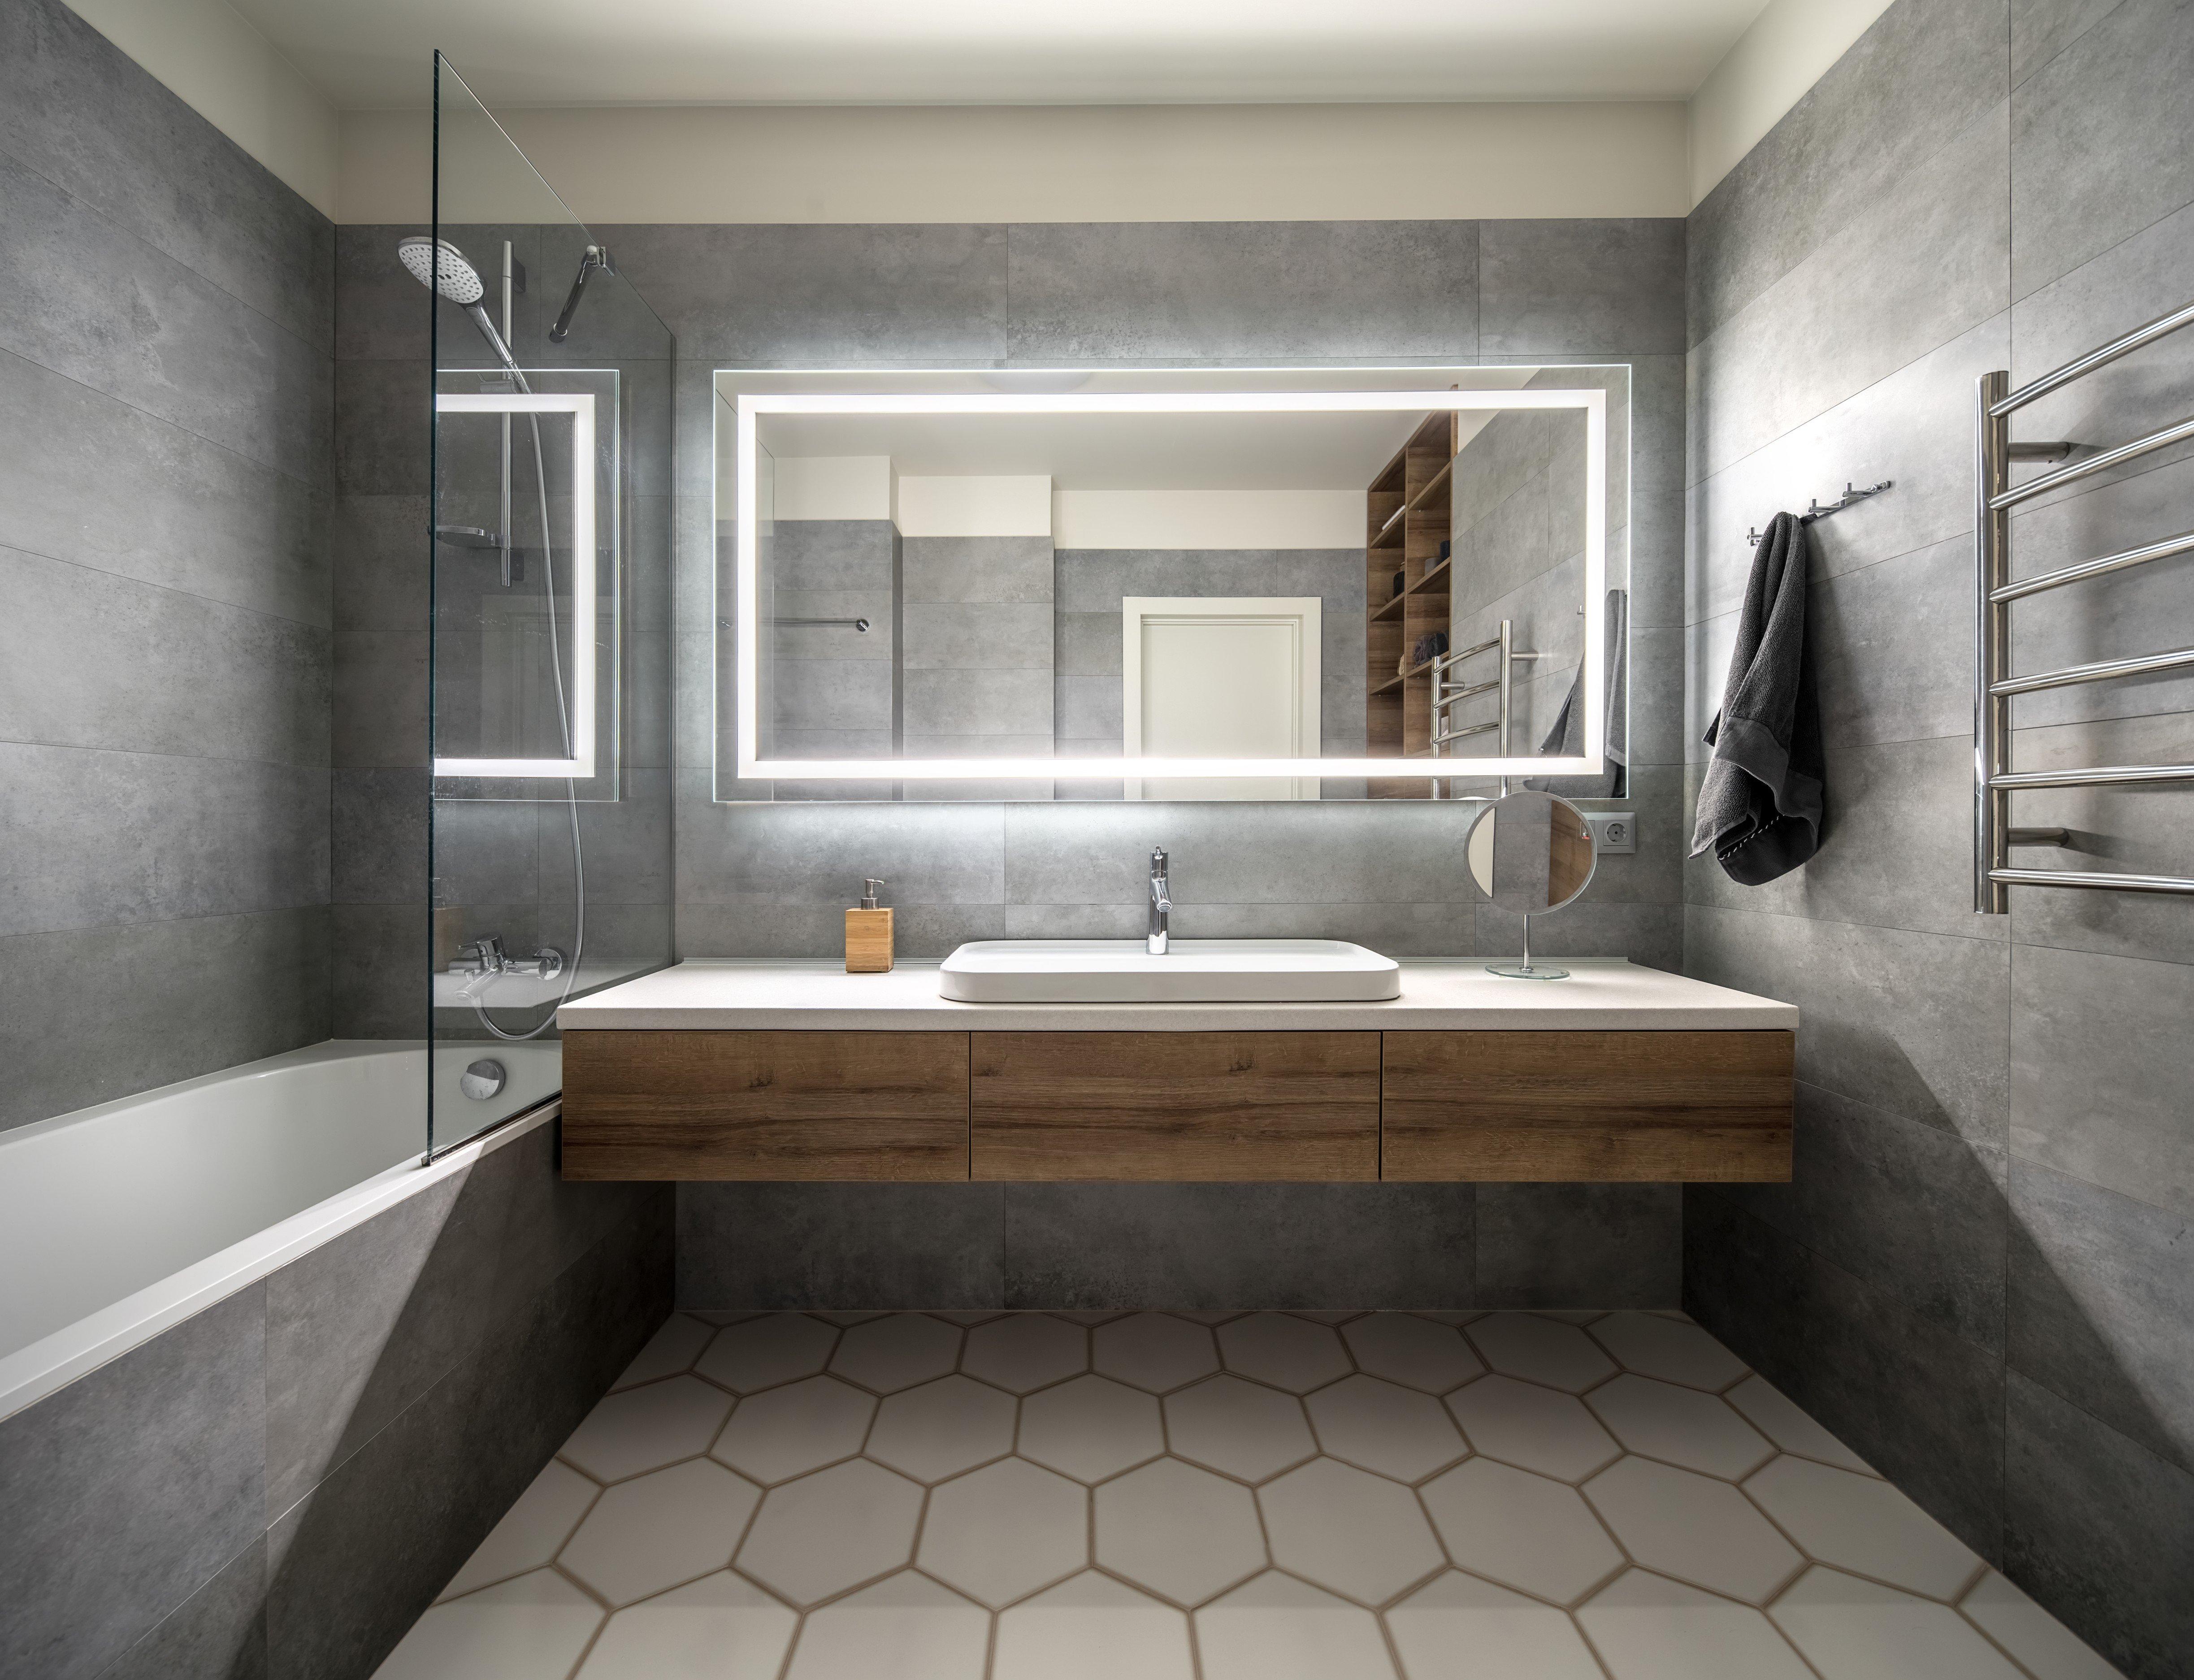 Top Bathroom Design Trends 2019 | Design Ideas for Bathrooms